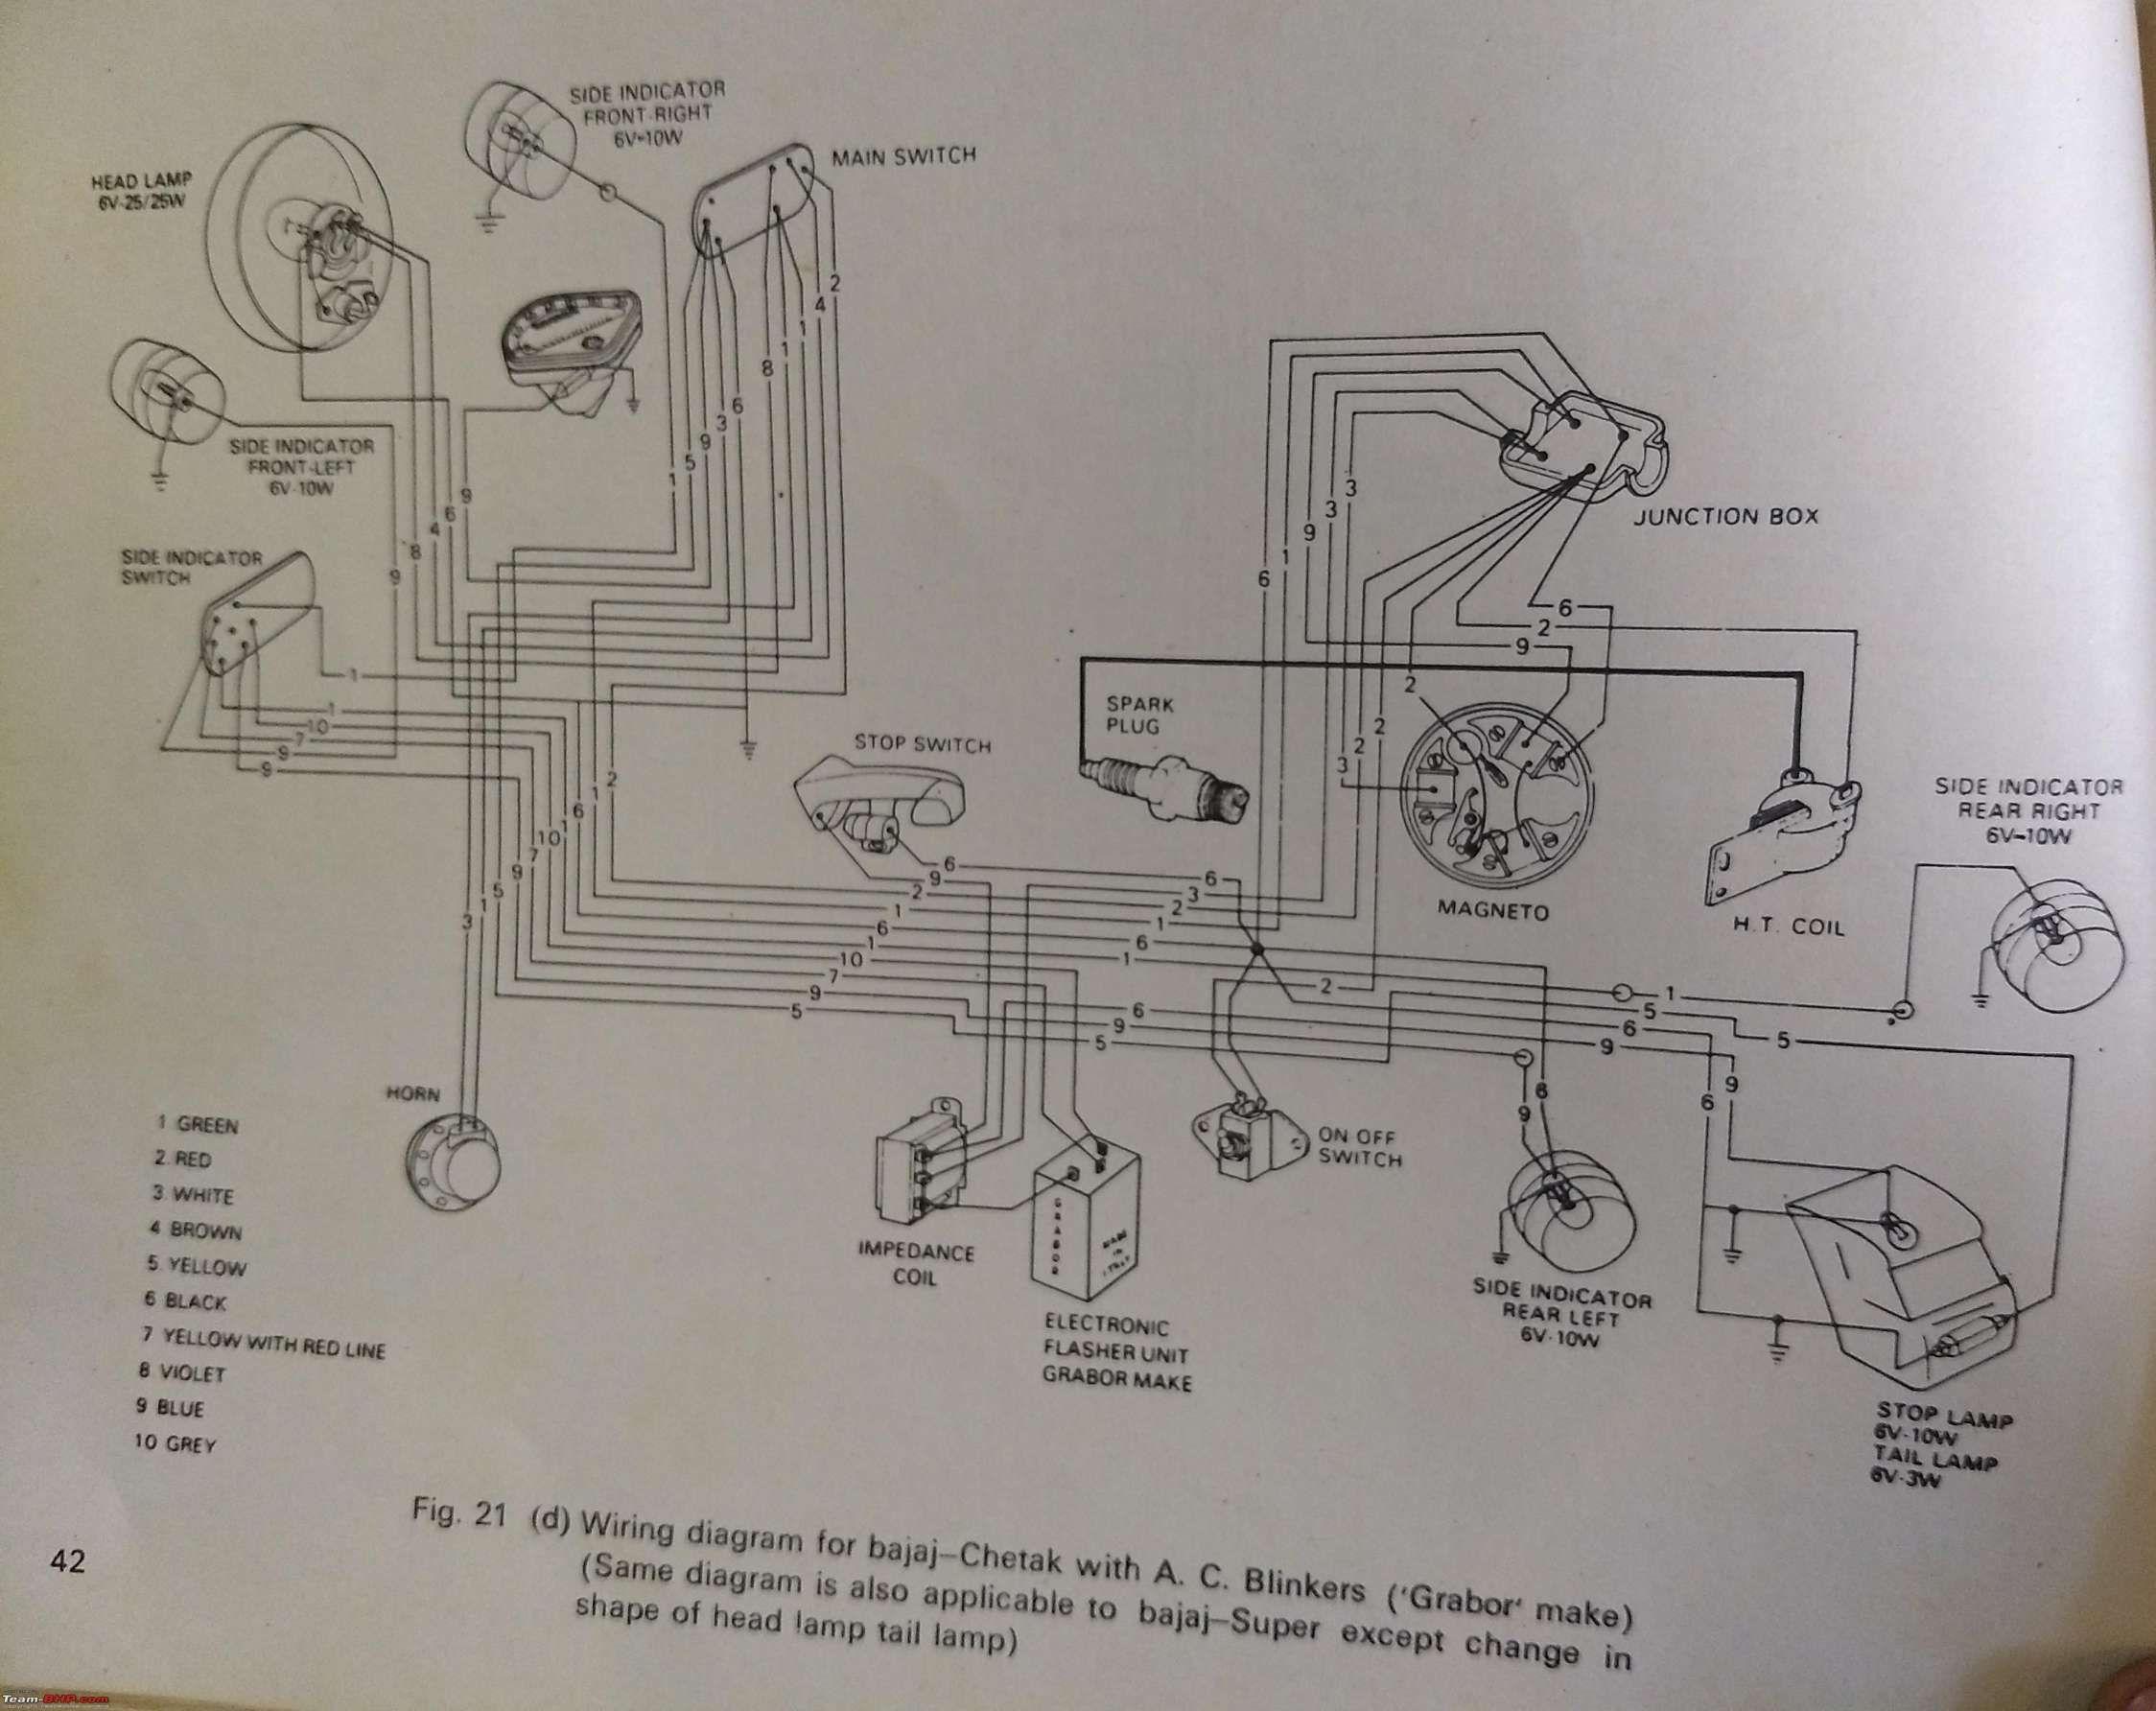 Hero Honda Splendor Engine Diagram Wiring And Wiring Diagrams Of Indian Two Wheelers Team Bhp In 2021 Diagram Hero Honda